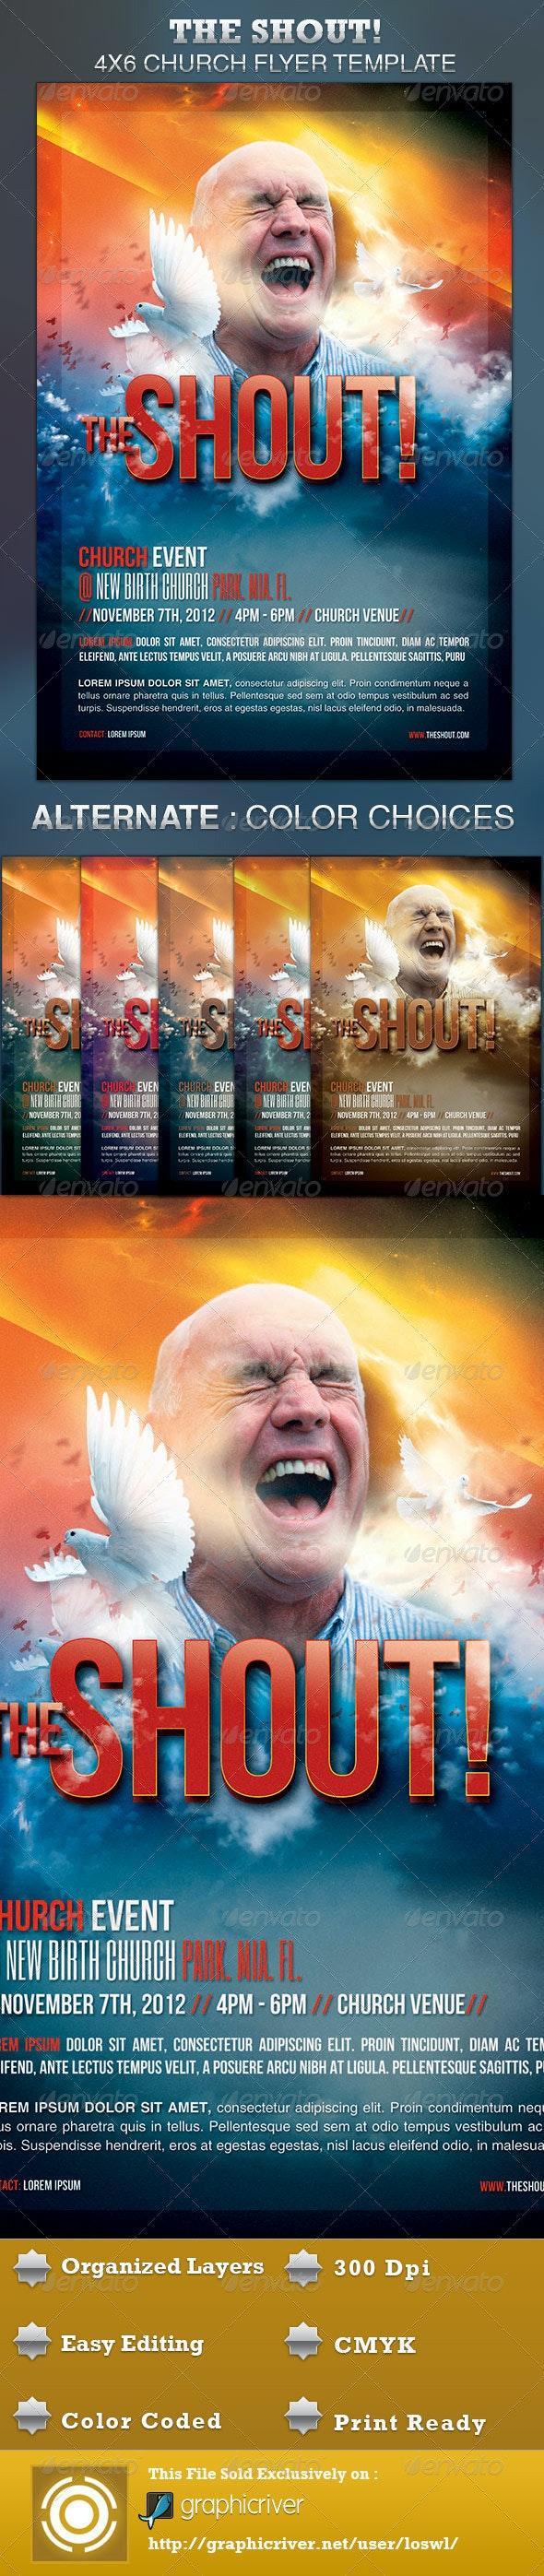 The Shout Church Event Flyer - Church Flyers